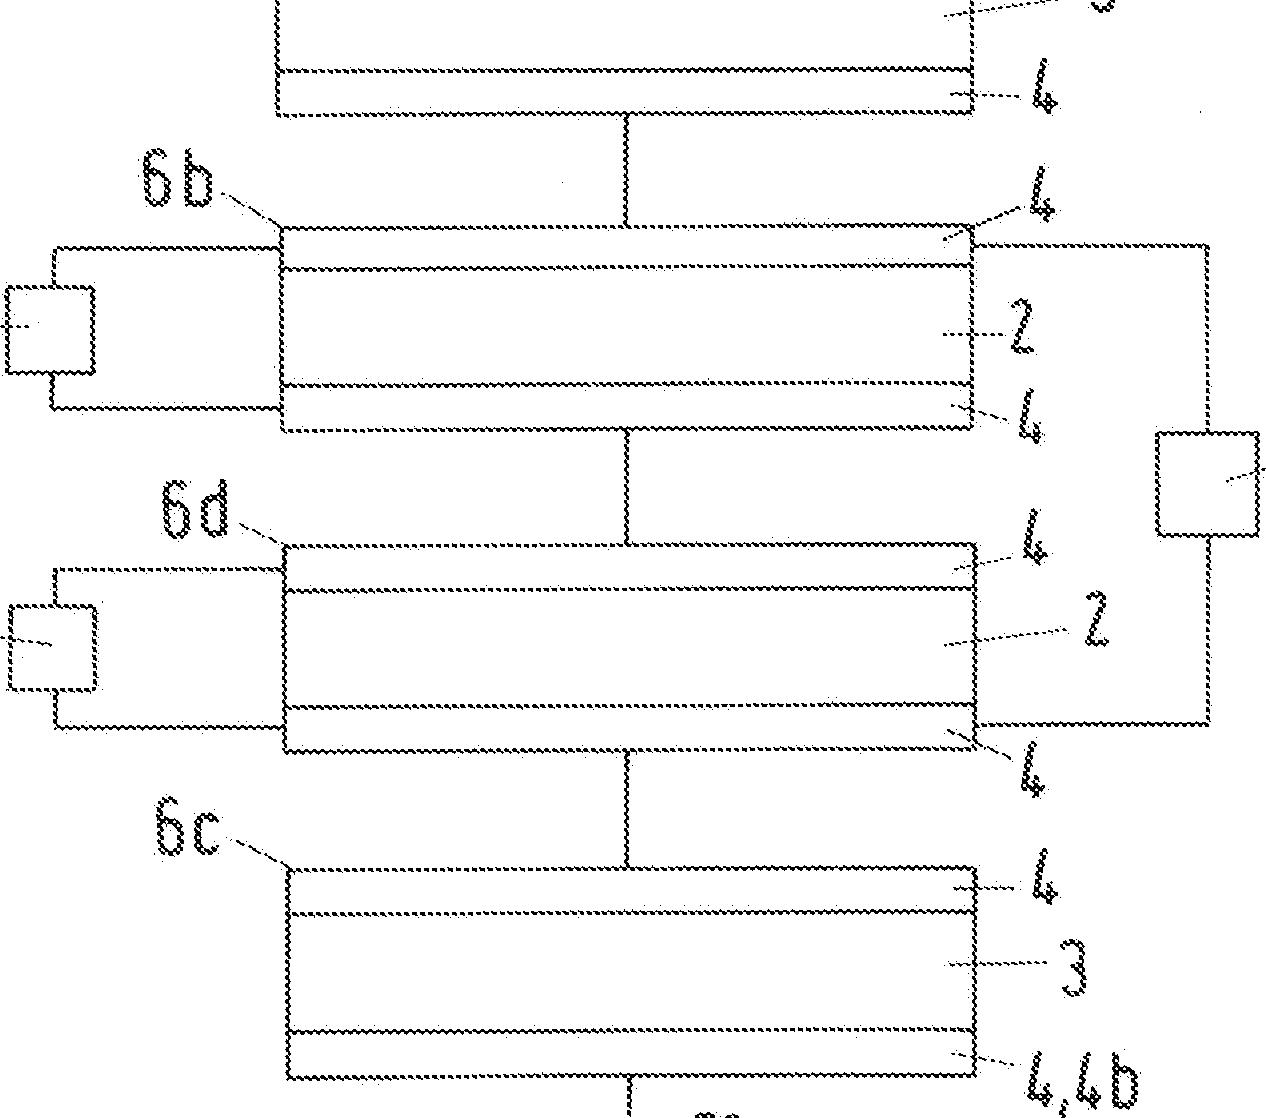 Figure GB2560938A_D0016